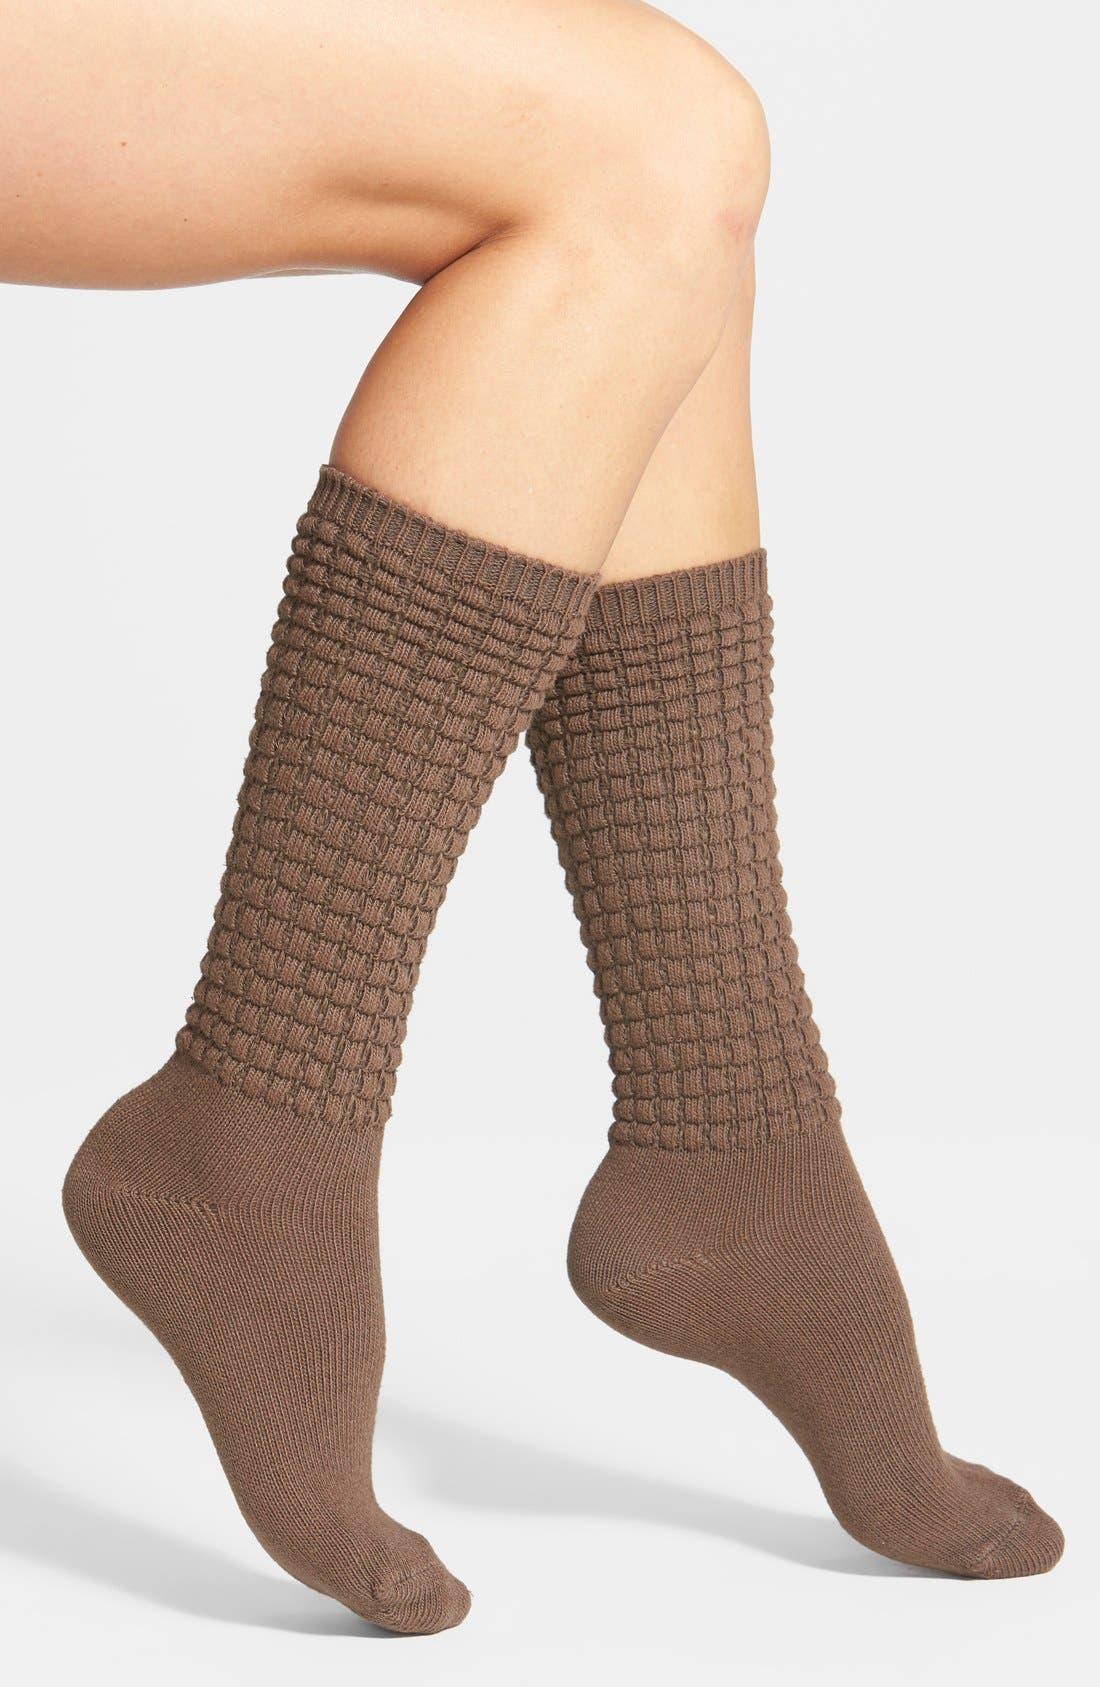 Alternate Image 1 Selected - Hue Textured Knit Socks